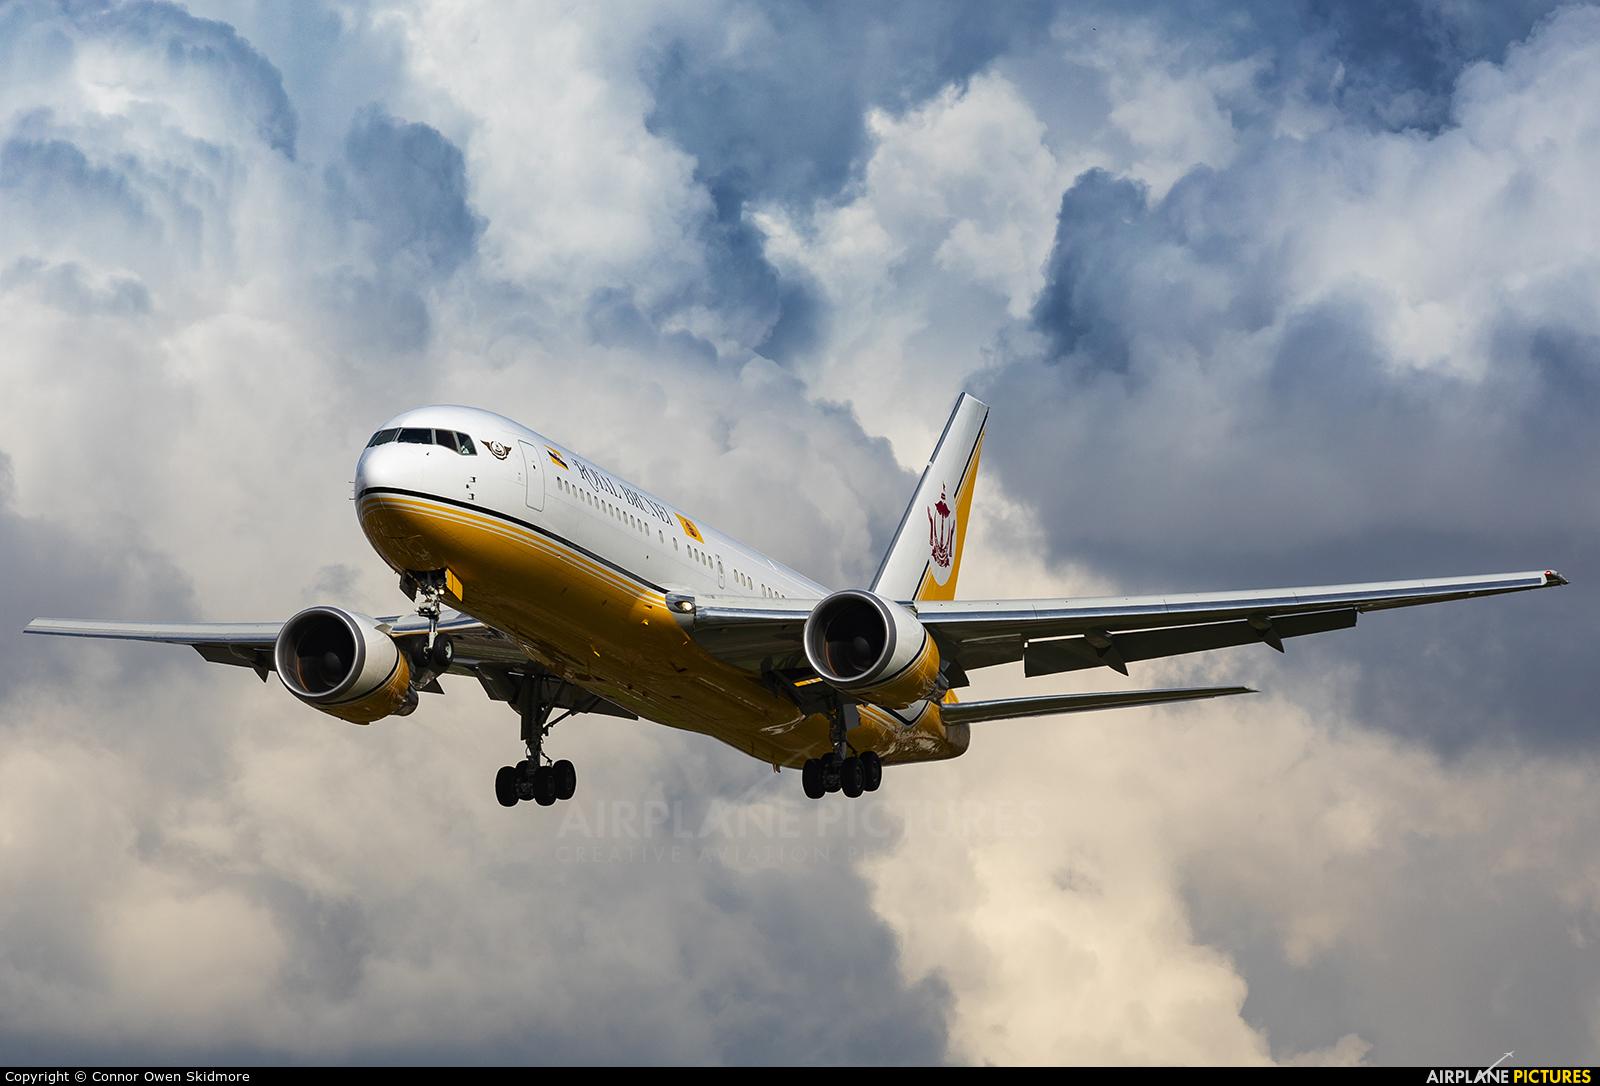 Royal Brunei Airlines V8-MHB aircraft at London - Heathrow